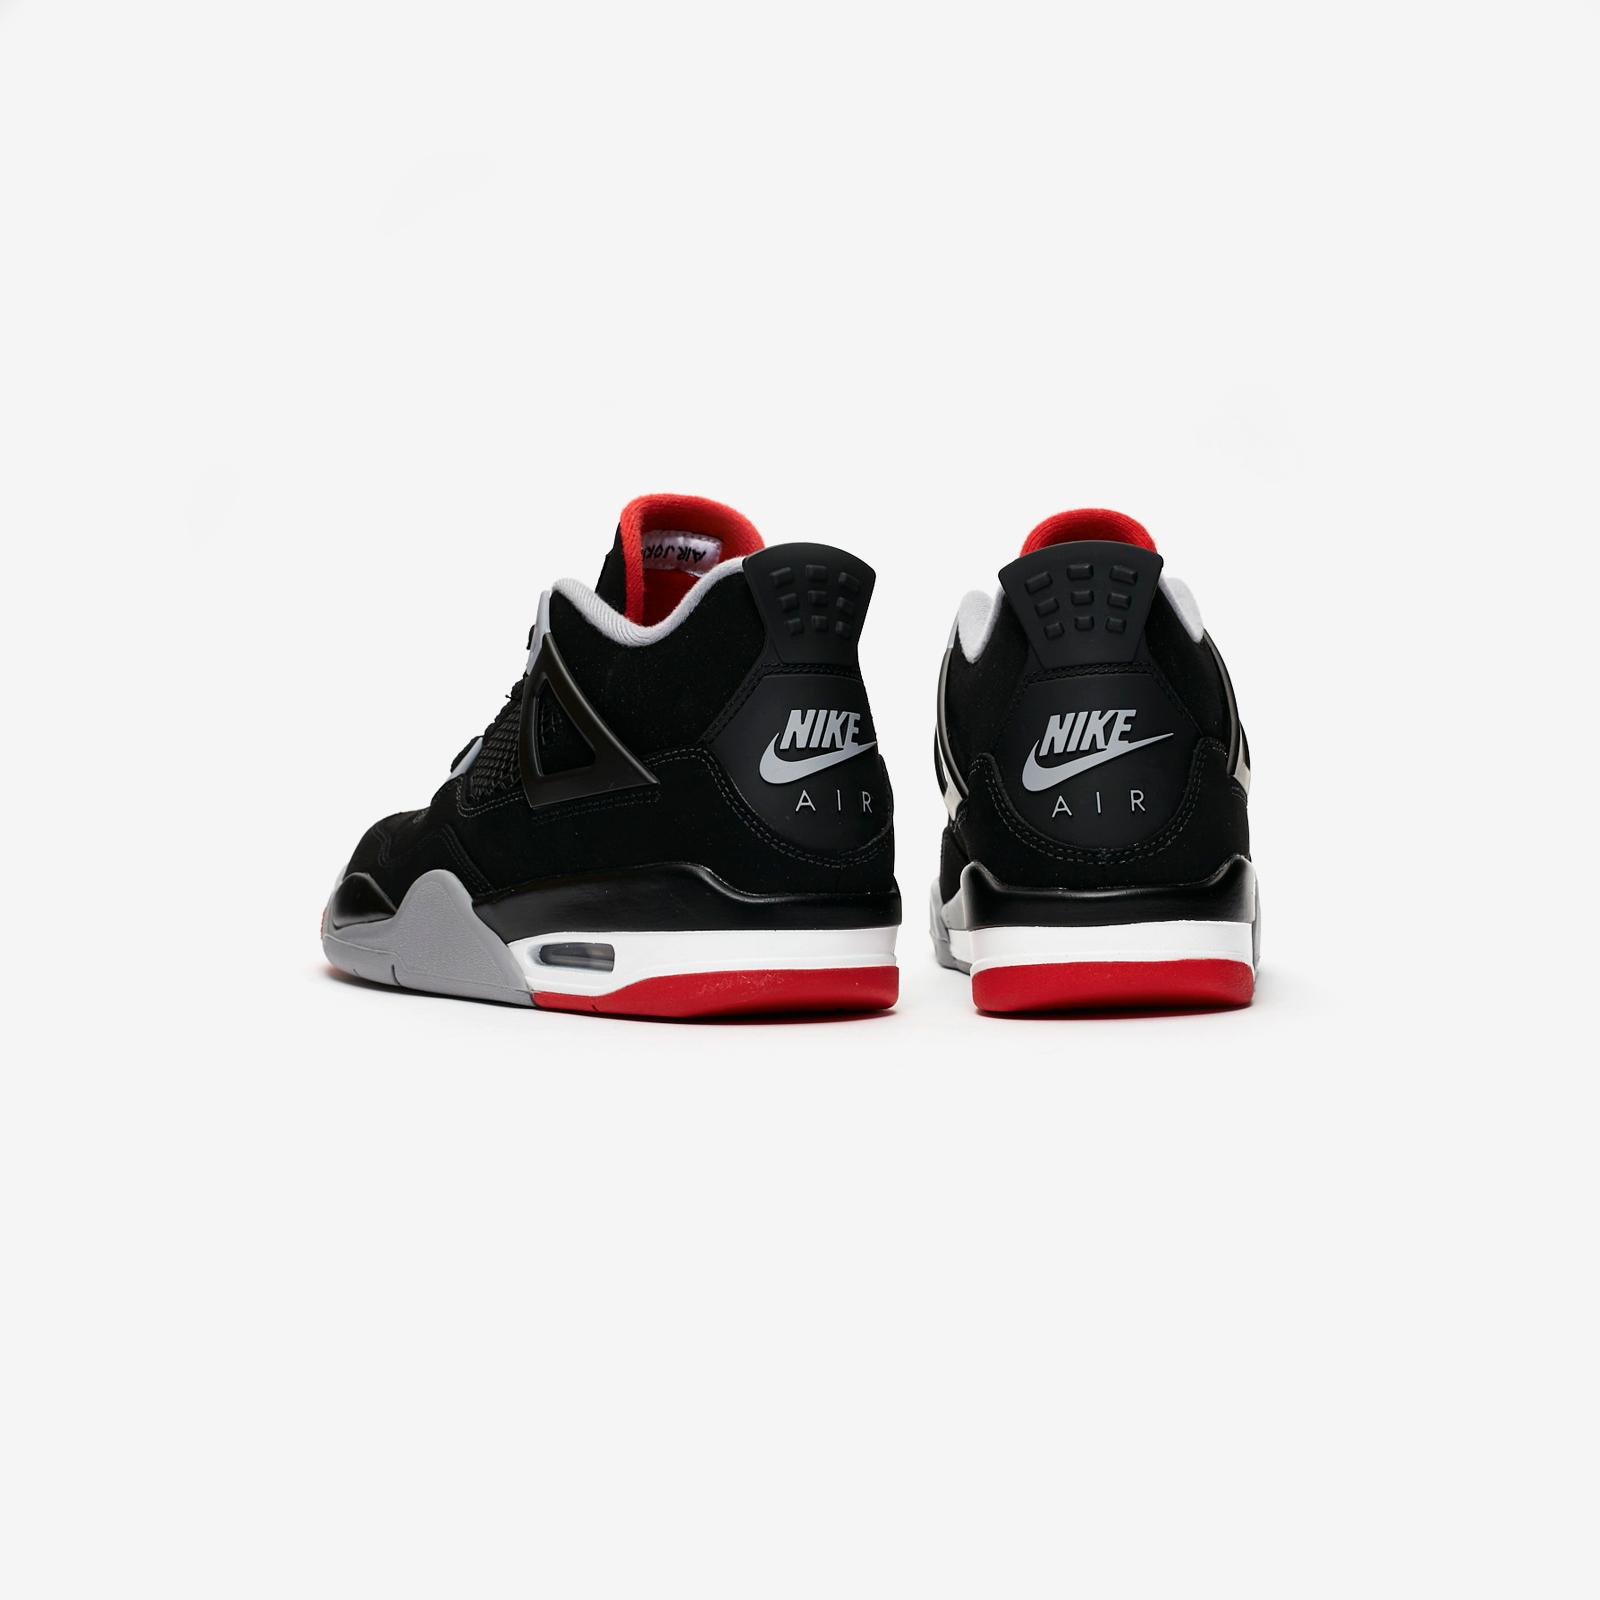 first rate e2be5 52ee9 Jordan Brand Air Jordan 4 Retro (GS) - 408452-060 - Sneakersnstuff    sneakers   streetwear online since 1999